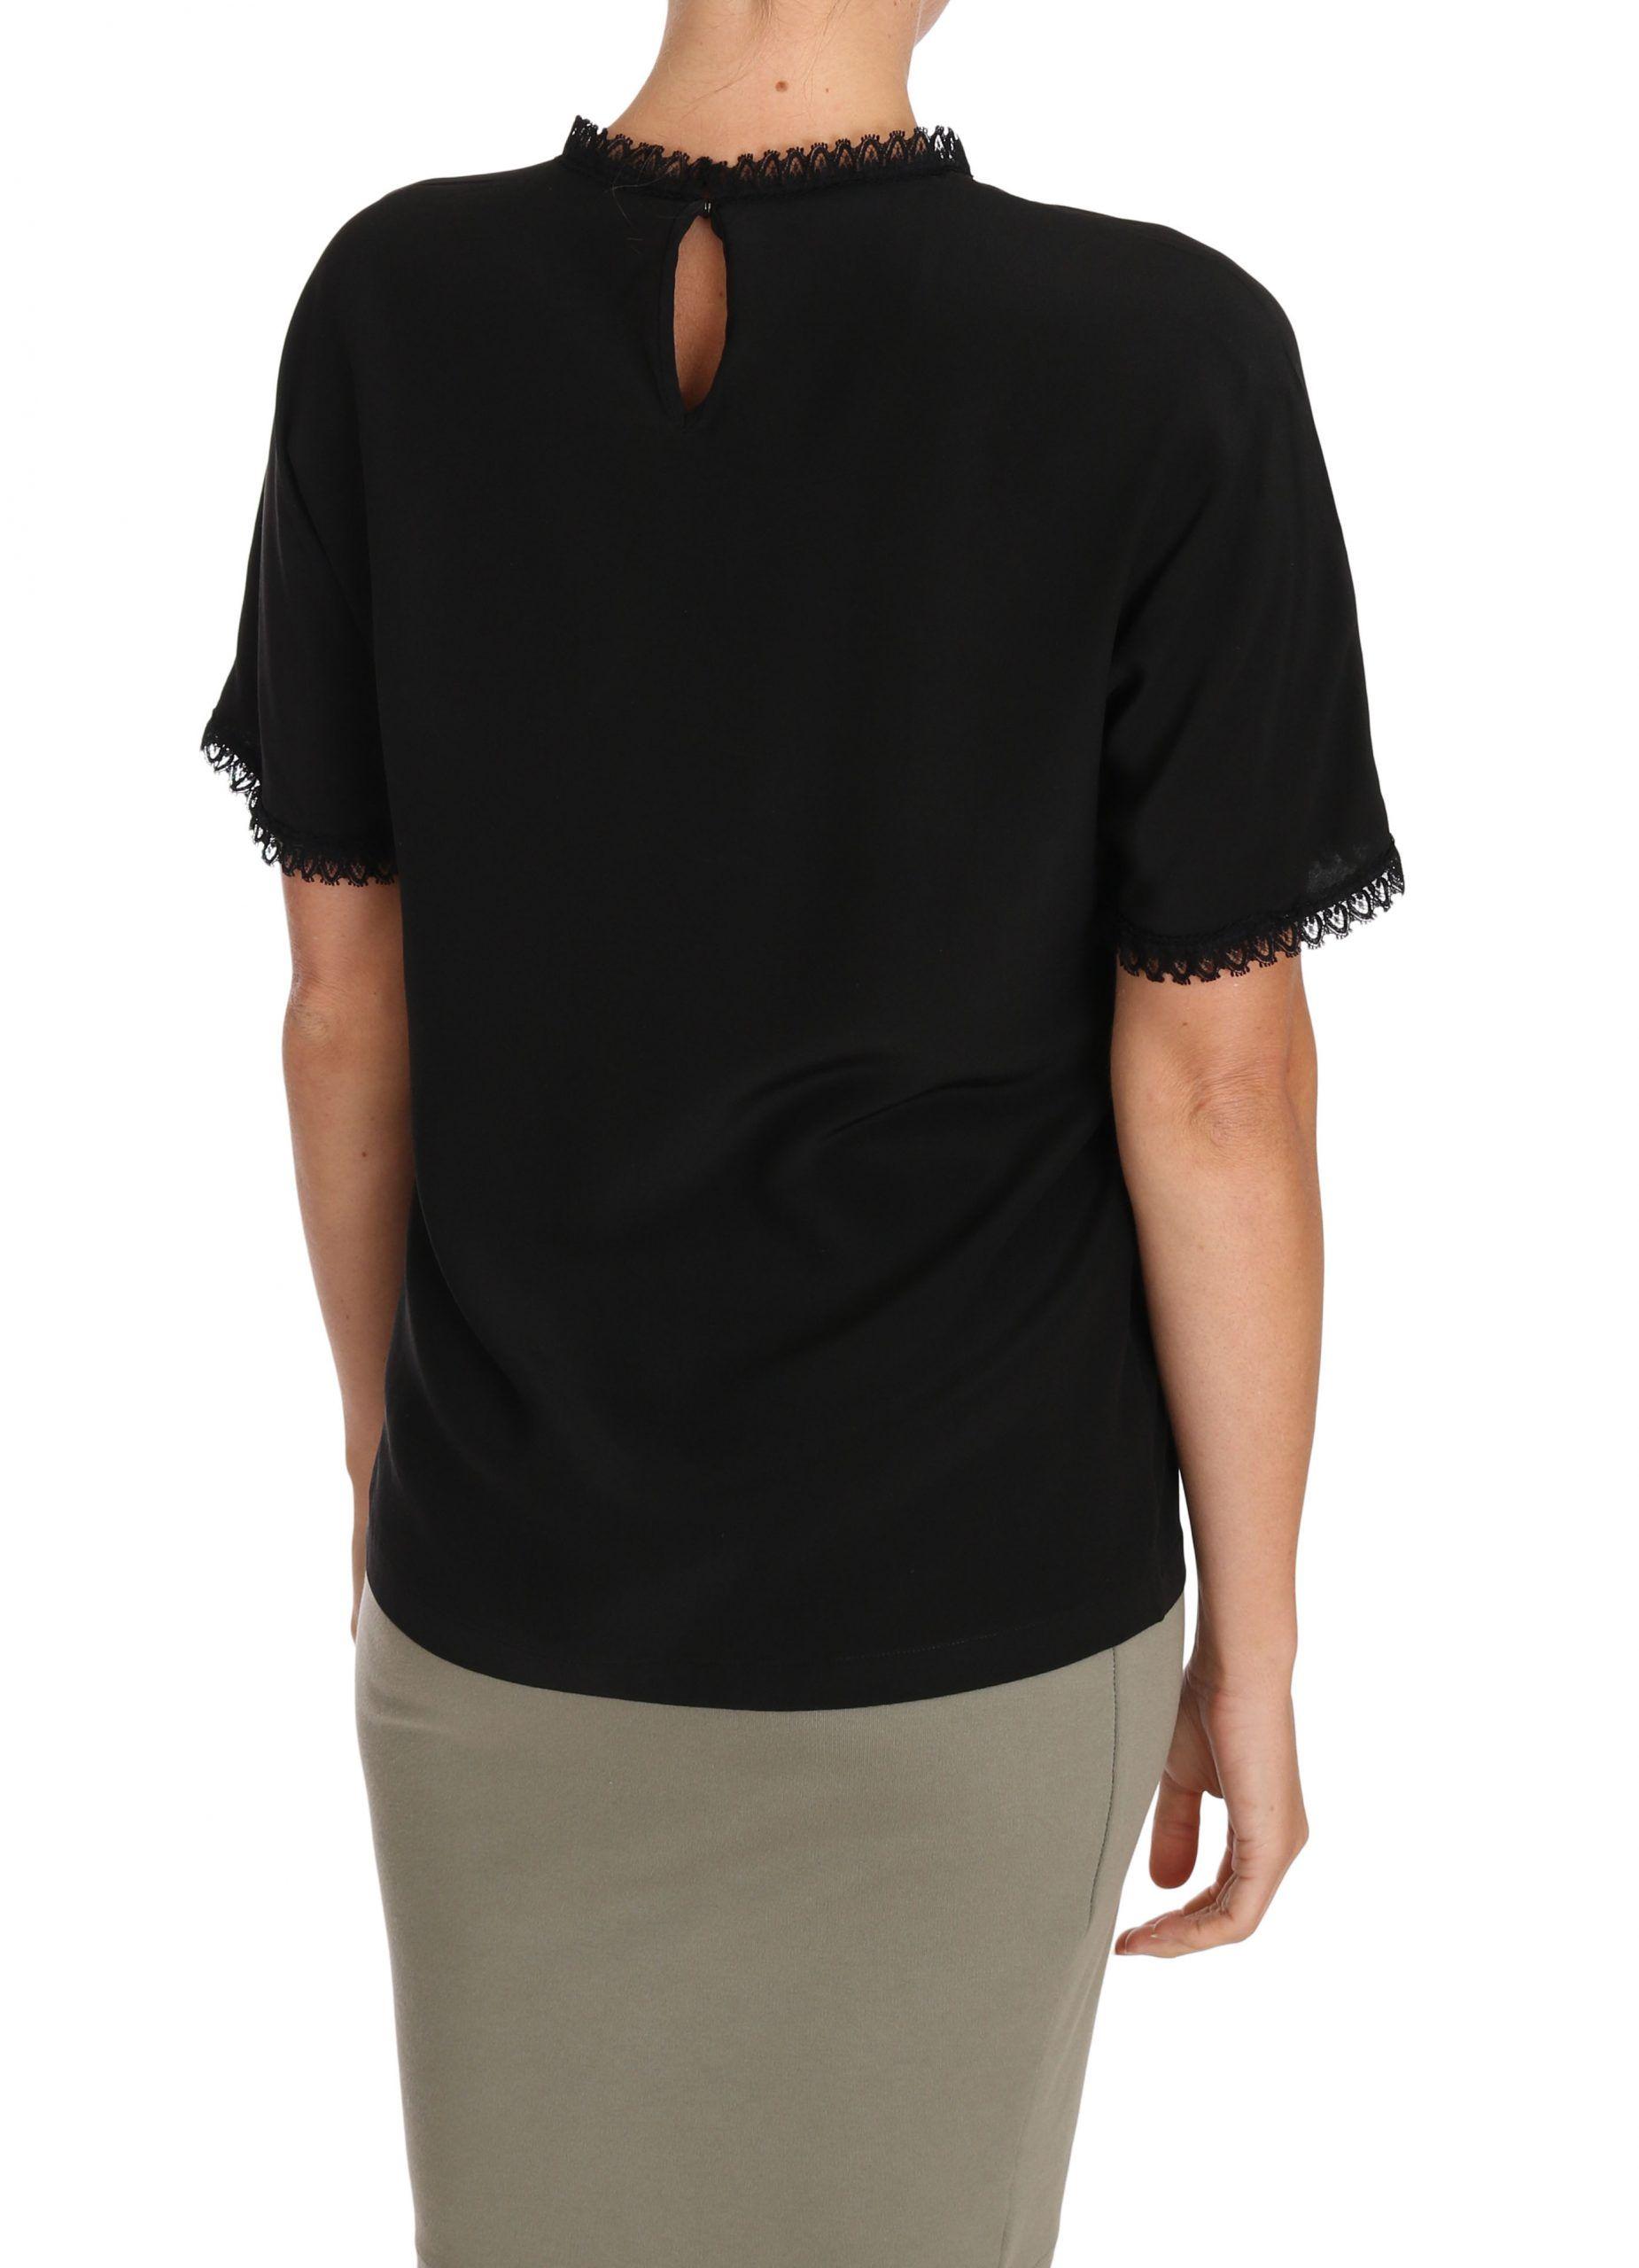 Dolce & Gabbana Black Silk Lace Top Blouse T-Shirt